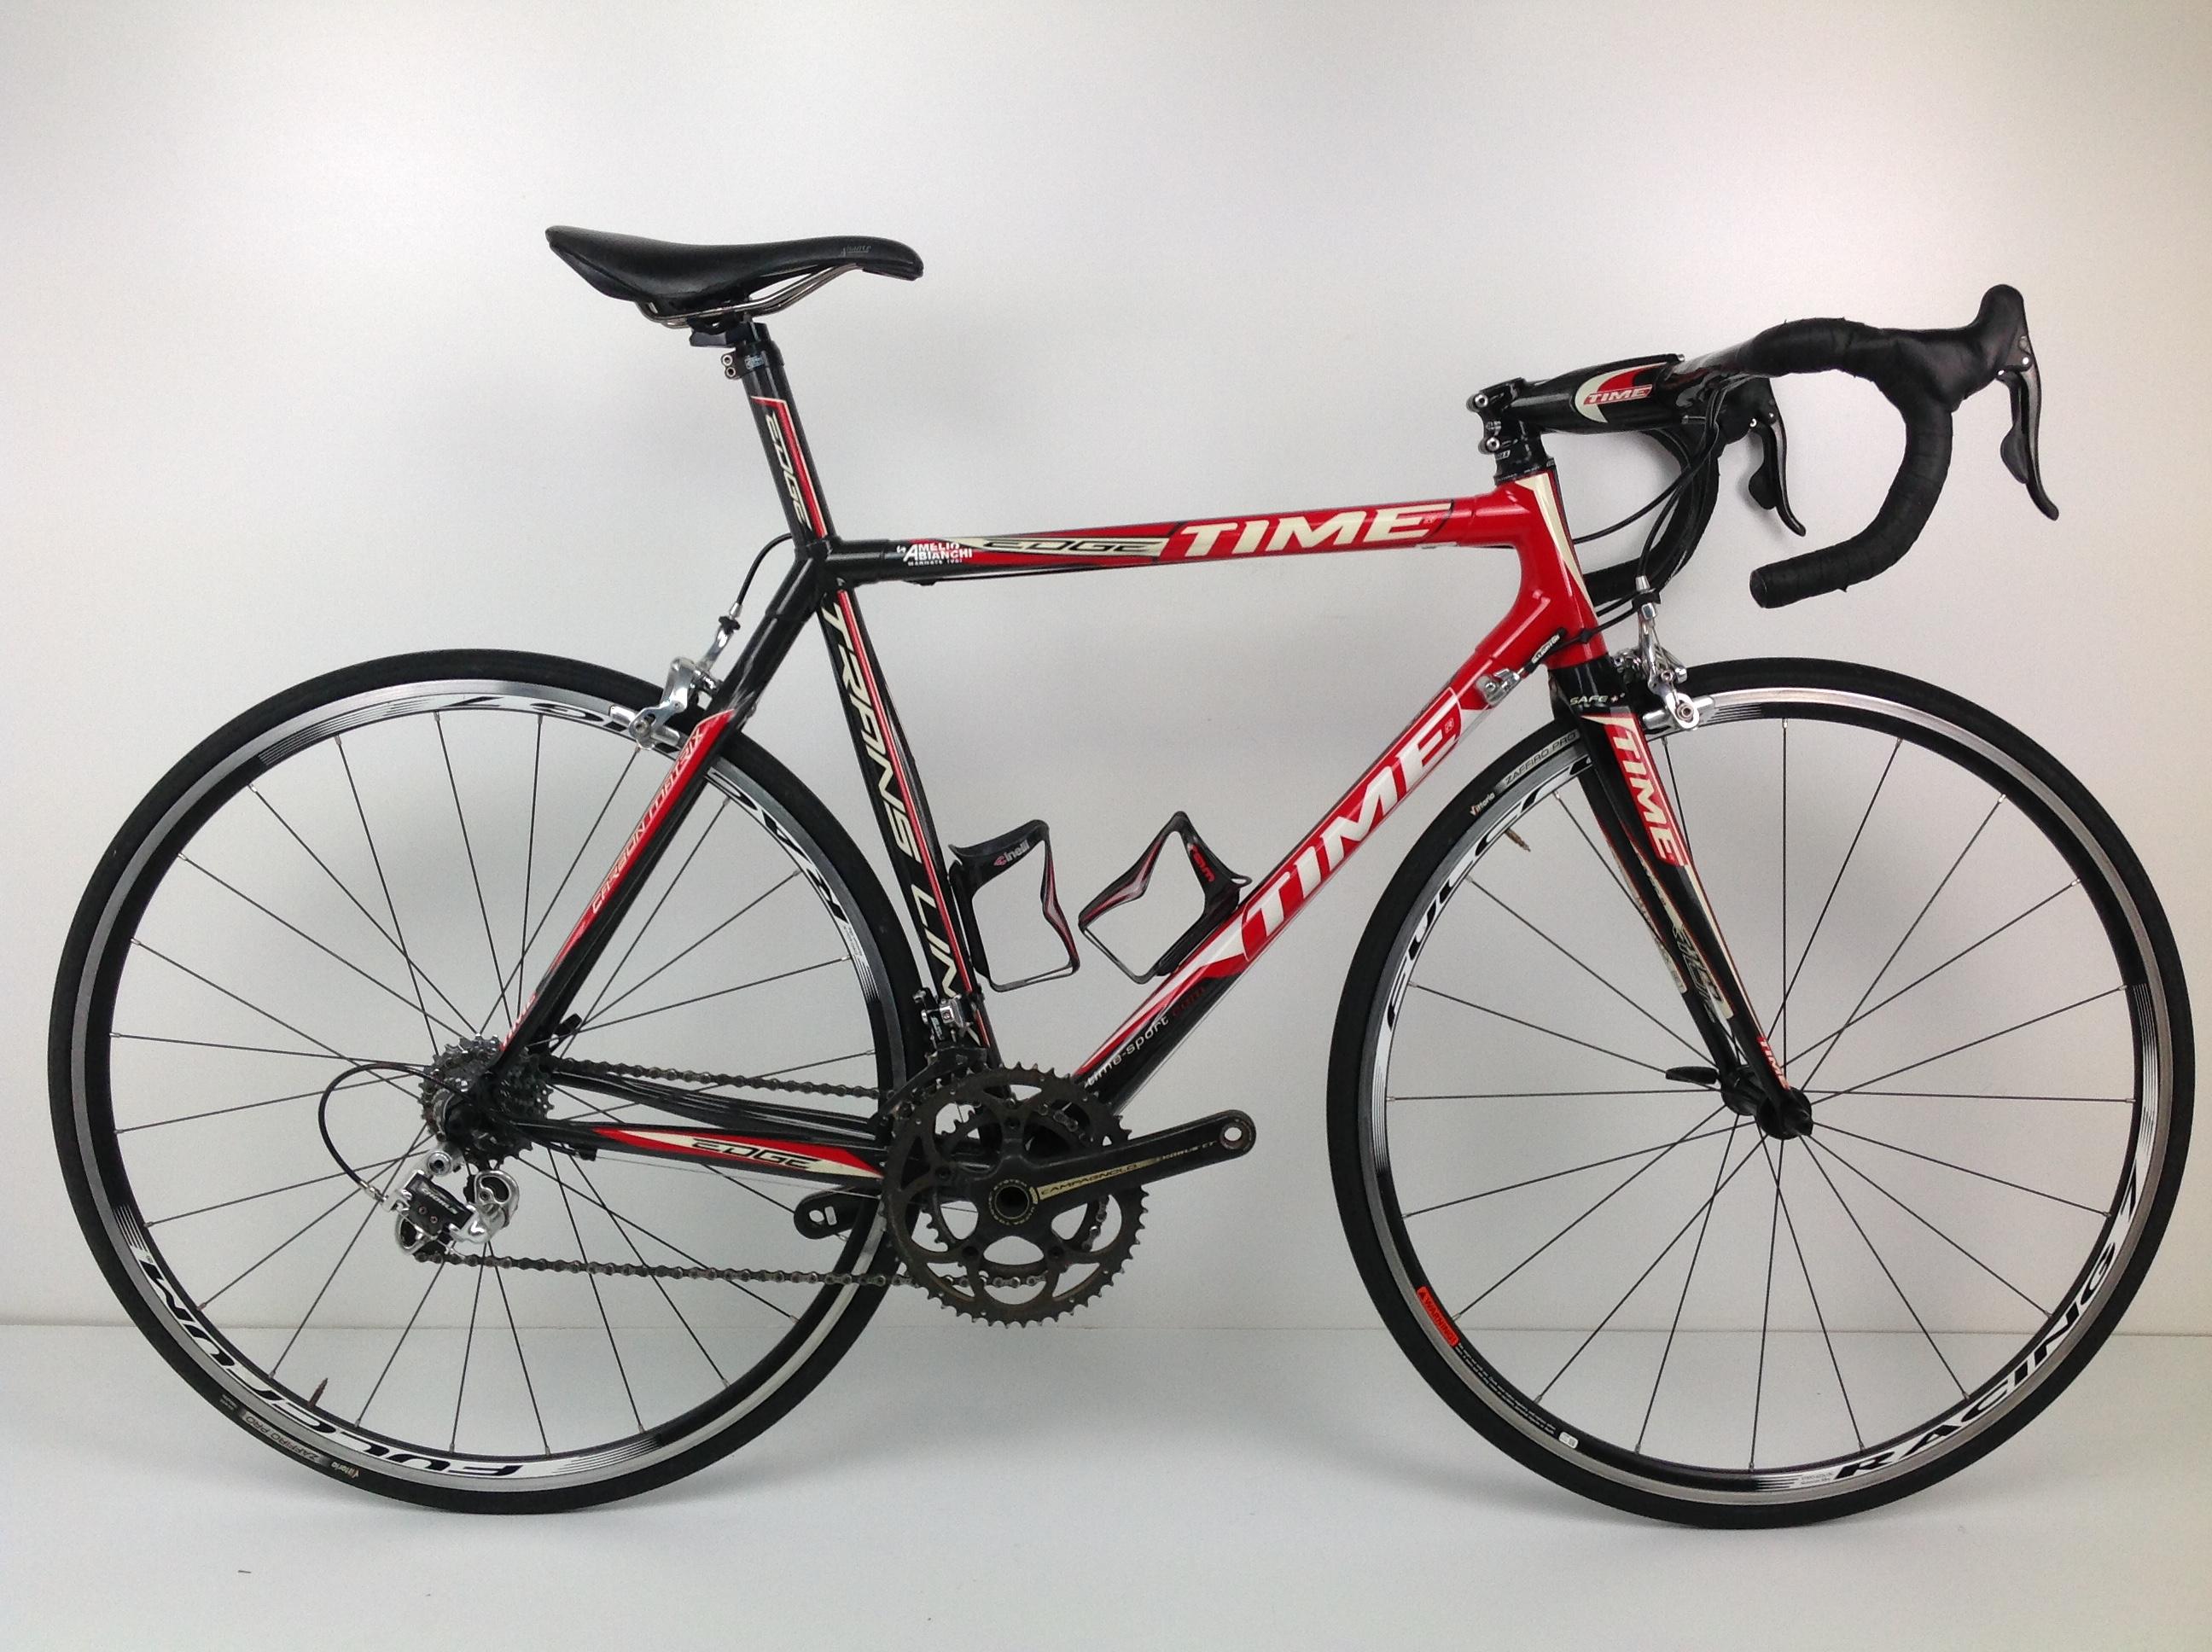 Bici Completa TIME EDGE TRANS LINK Taglia S